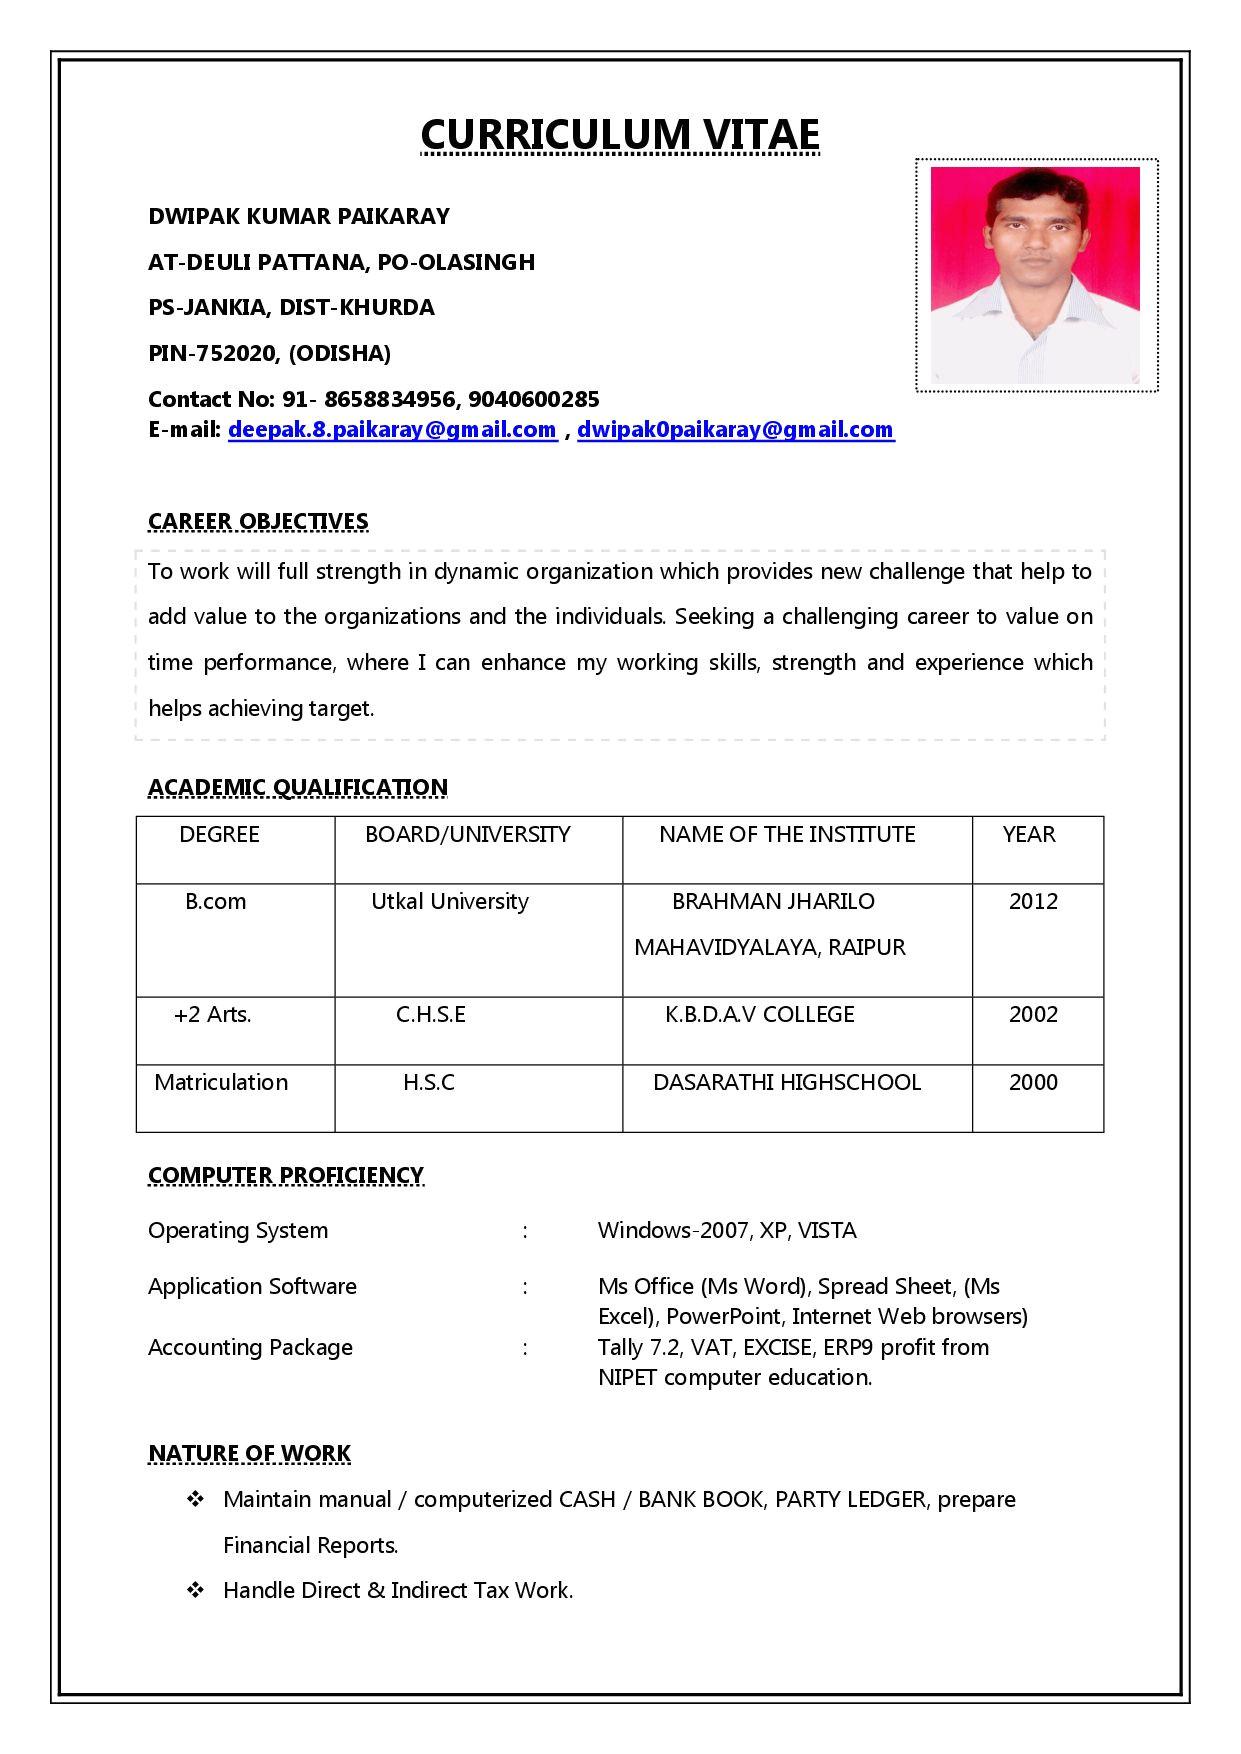 New Resume format for Job Job Job Resume format New Resume format Job Resume